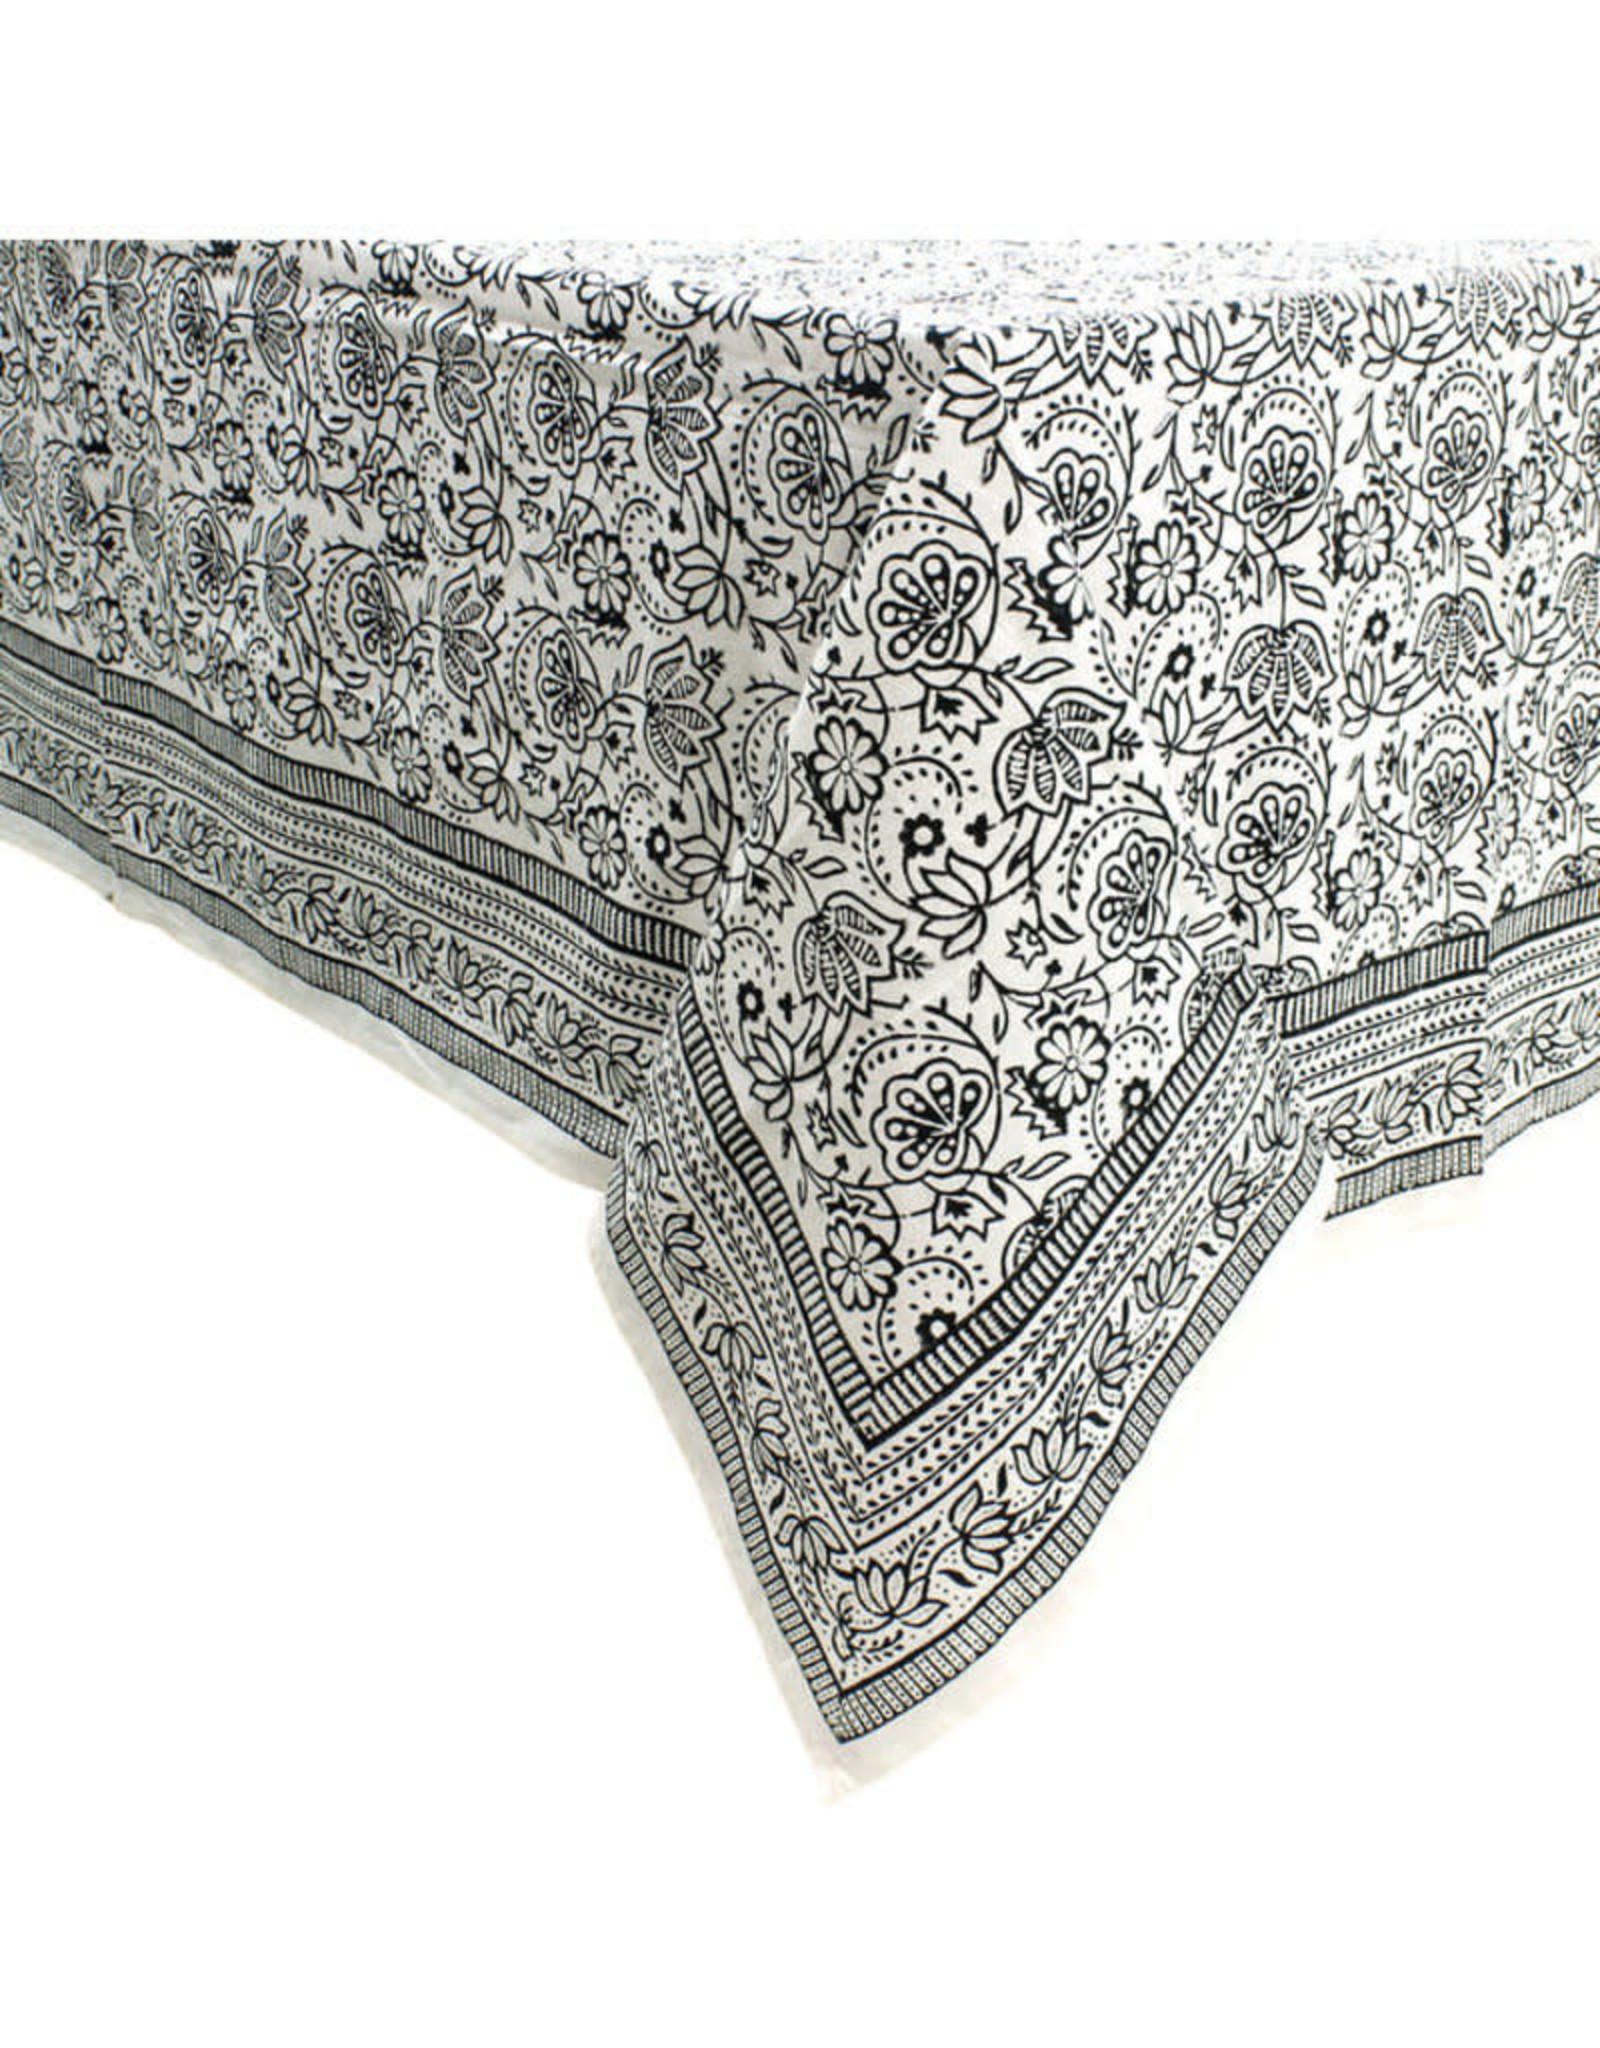 Asha Handicrafts Monochrome Block Print Tablecloth